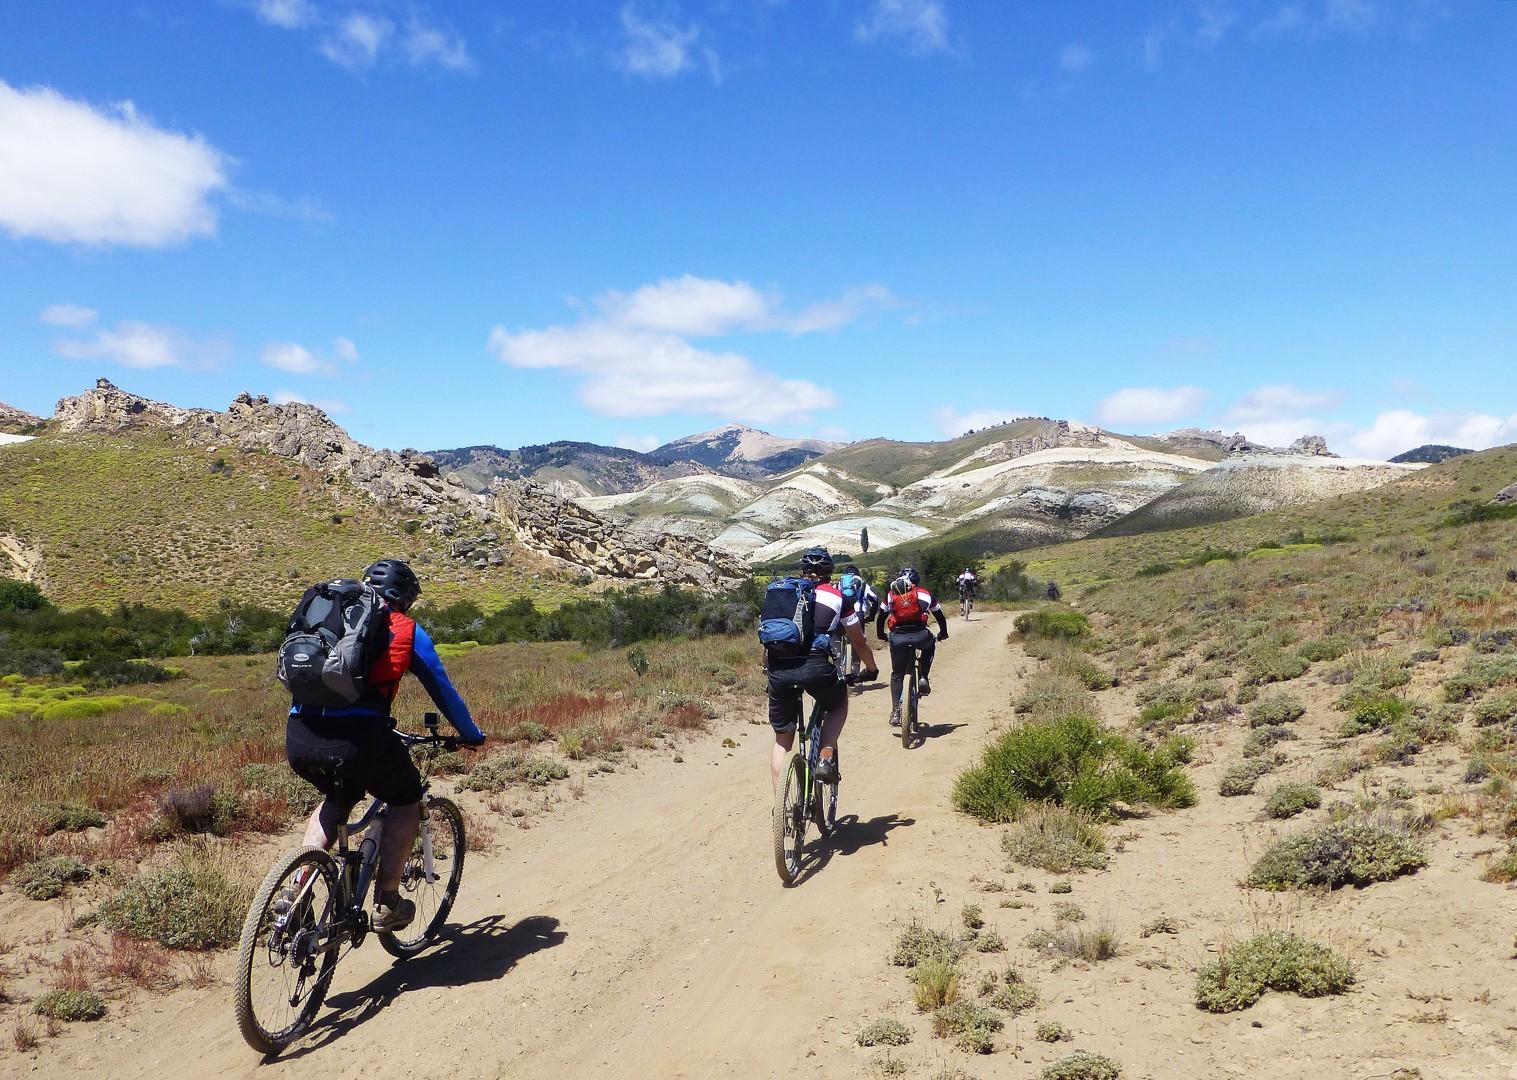 P1020802.JPG - Chile and Argentina - Wild Patagonia - Mountain Biking